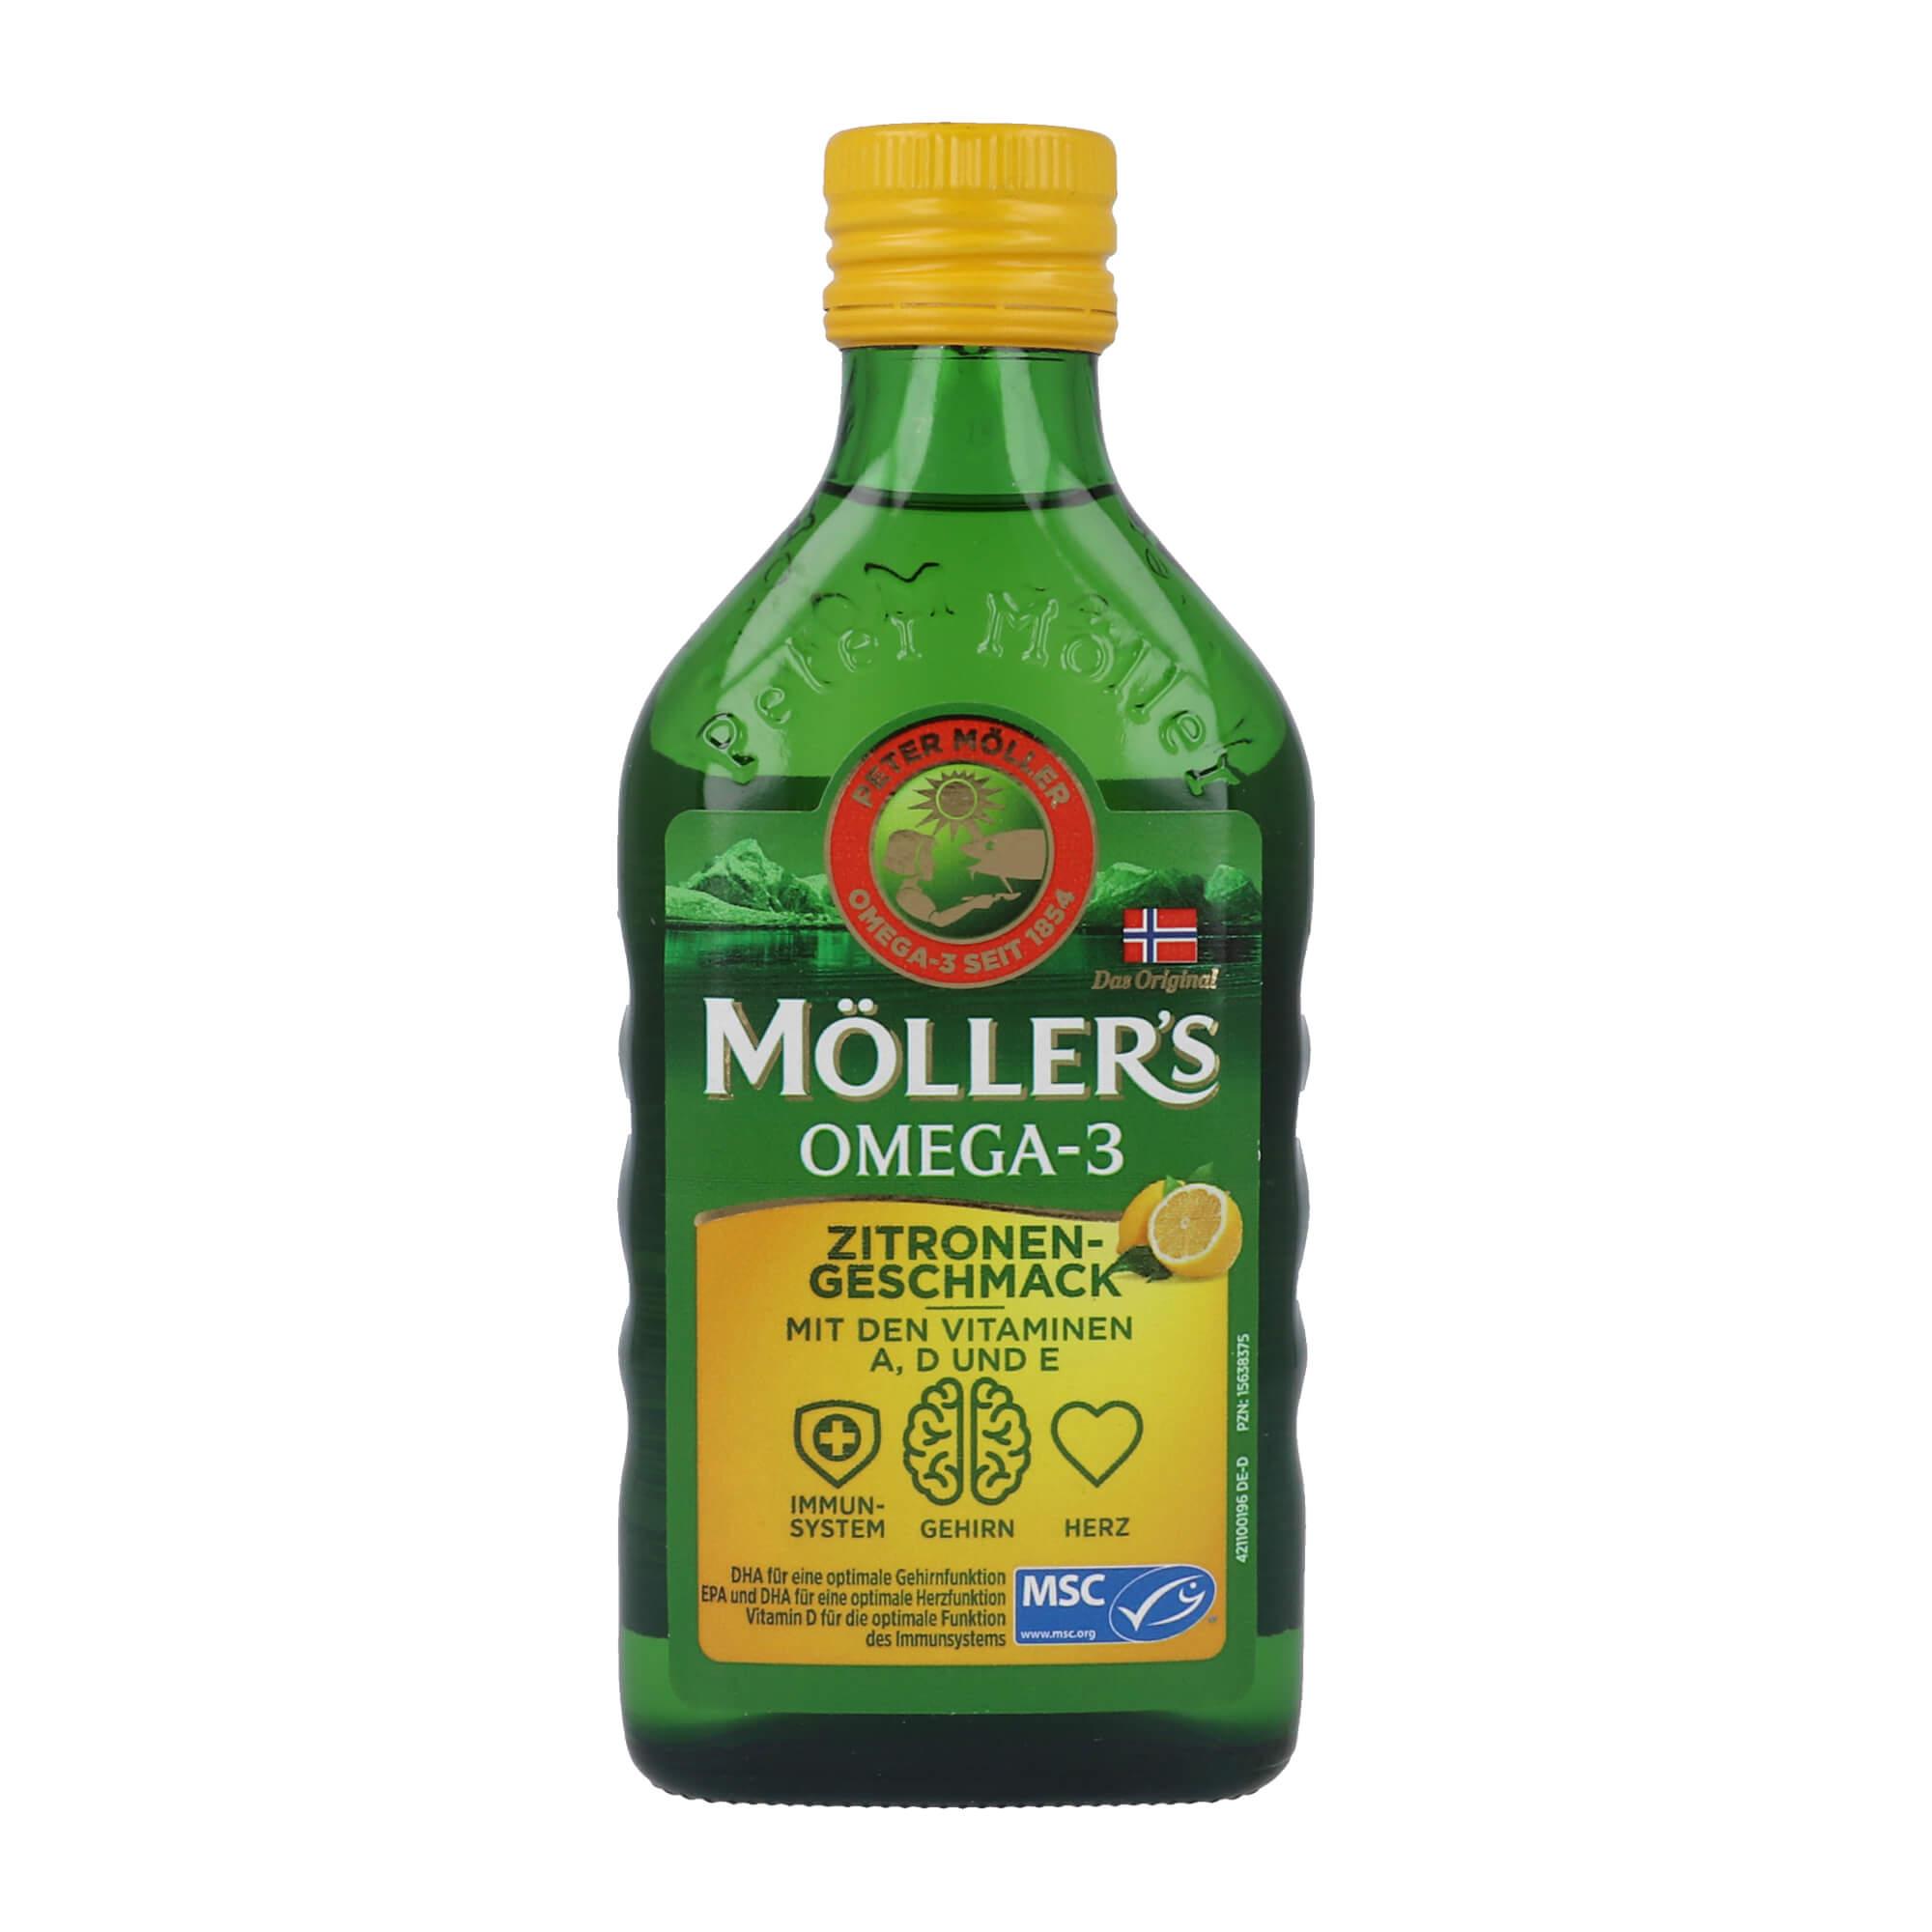 Möller's Omega-3 Zitronengeschmack Öl